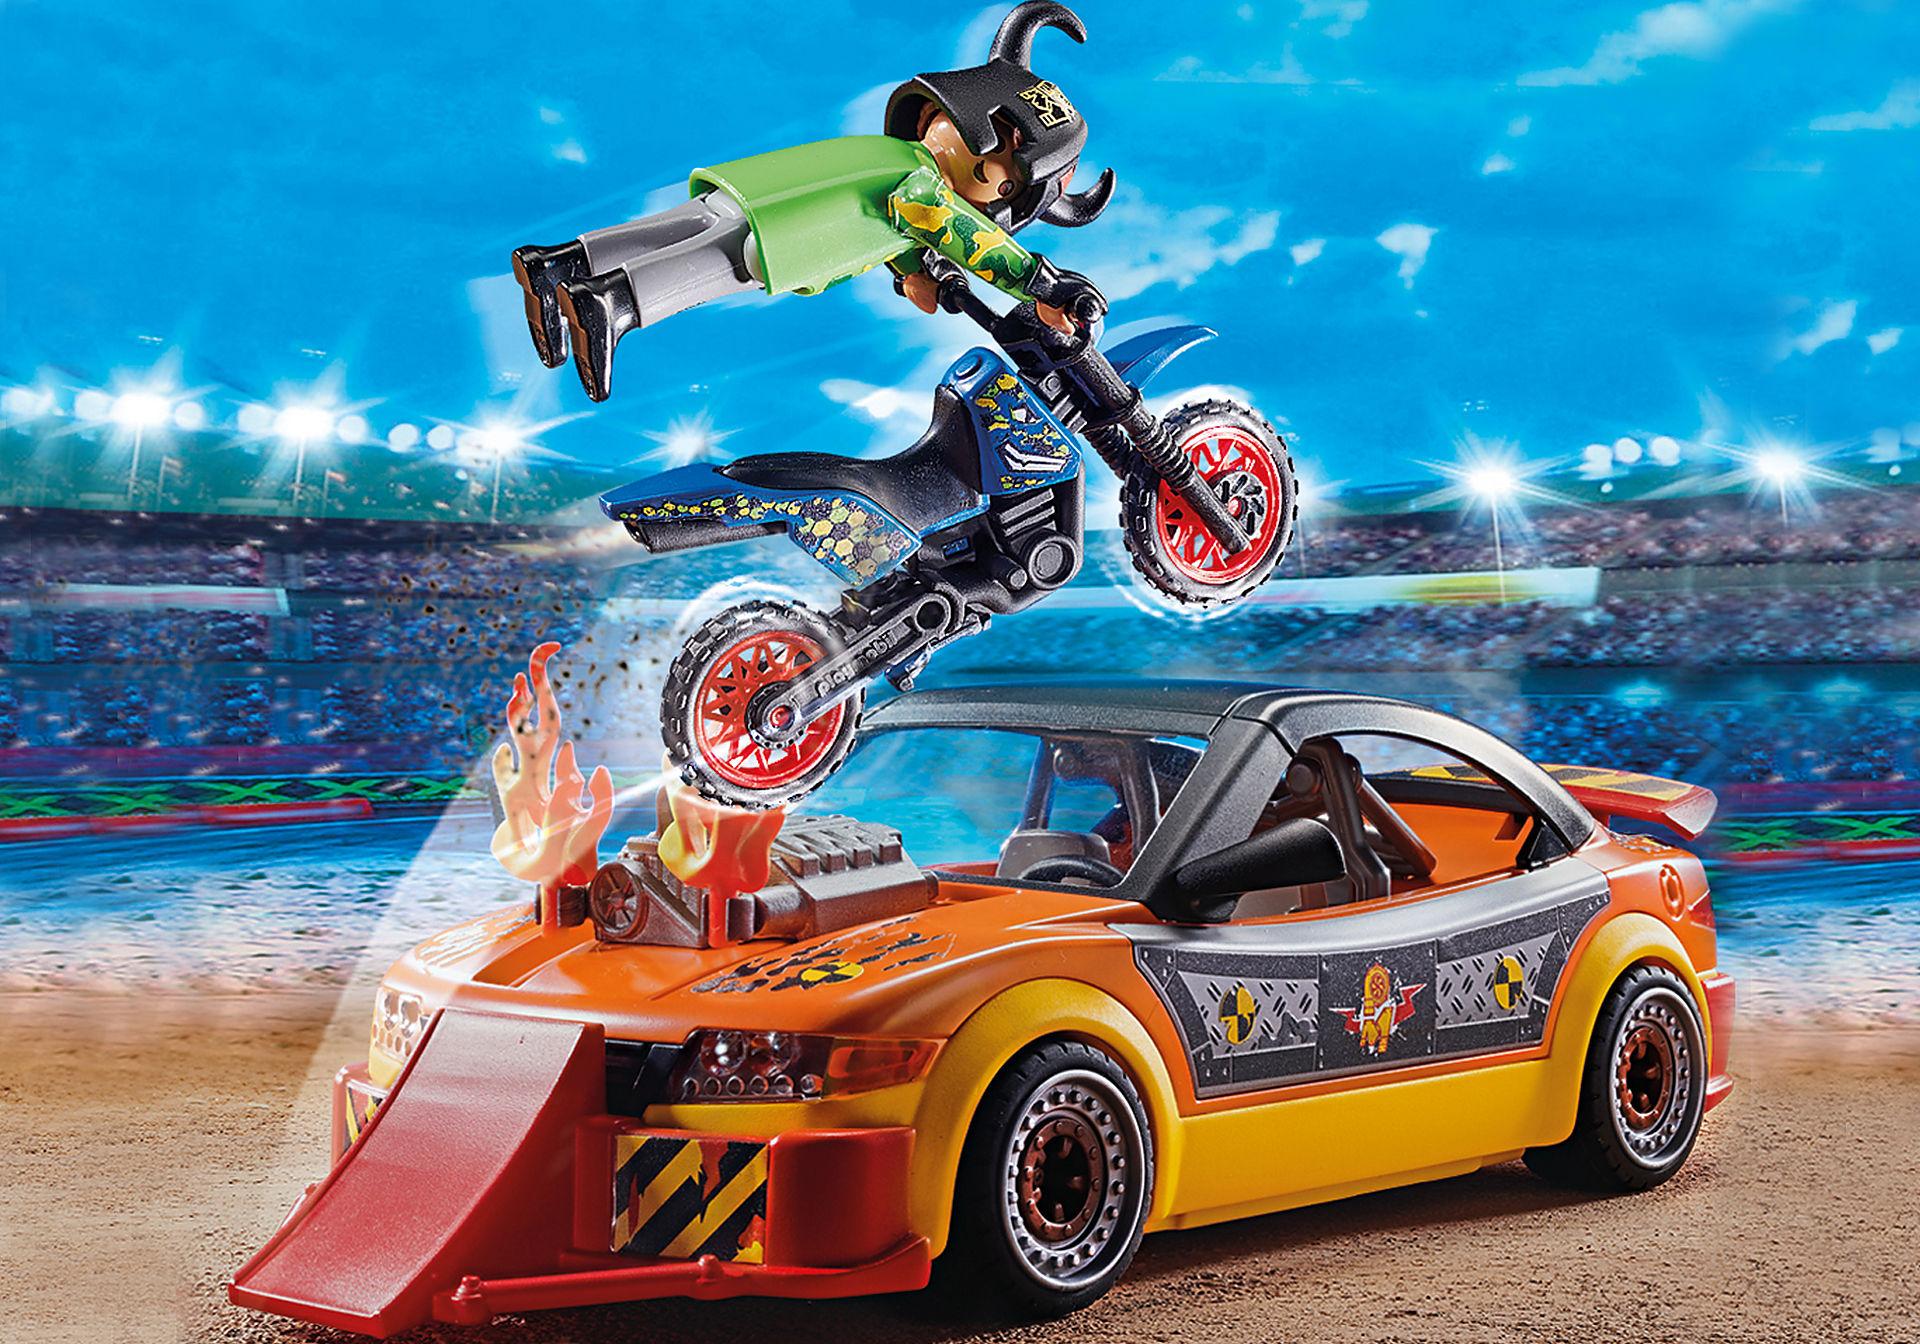 70551 Stuntshow Voiture crash test avec mannequin zoom image4